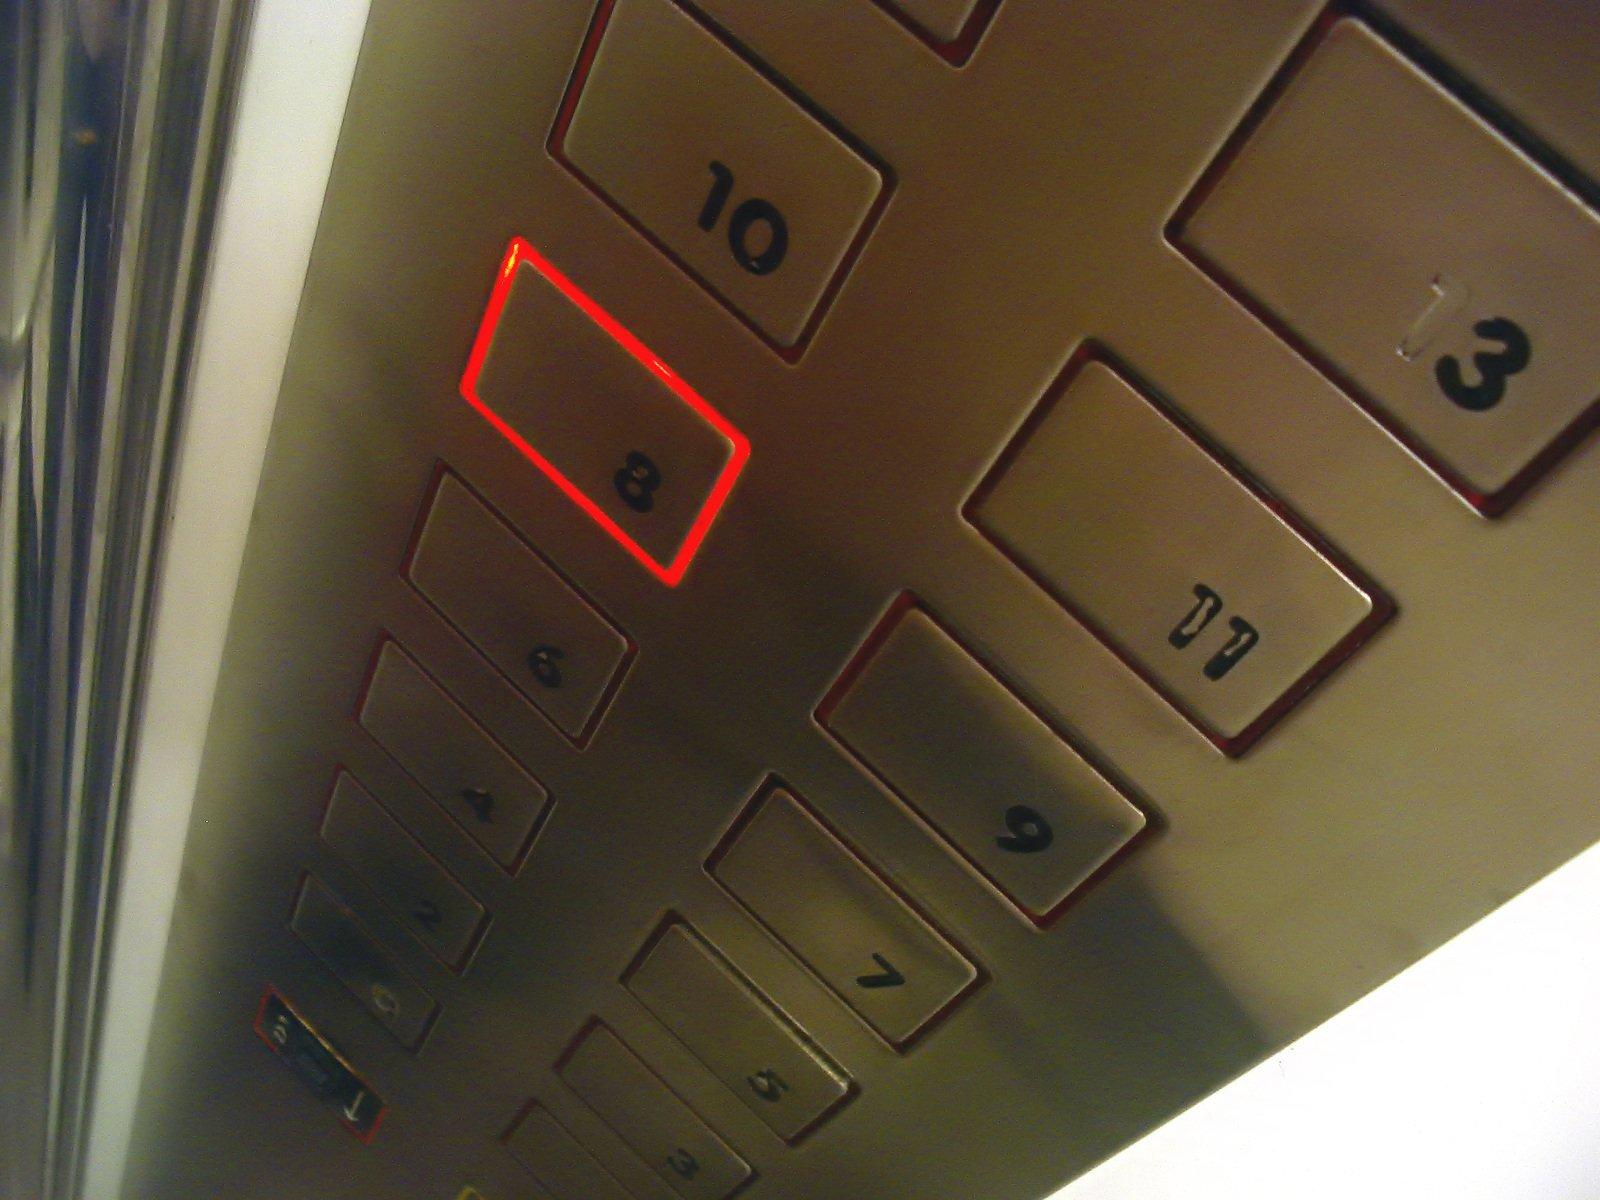 Asombroso: Un italiano desempleado duerme en un ascensor en Florencia